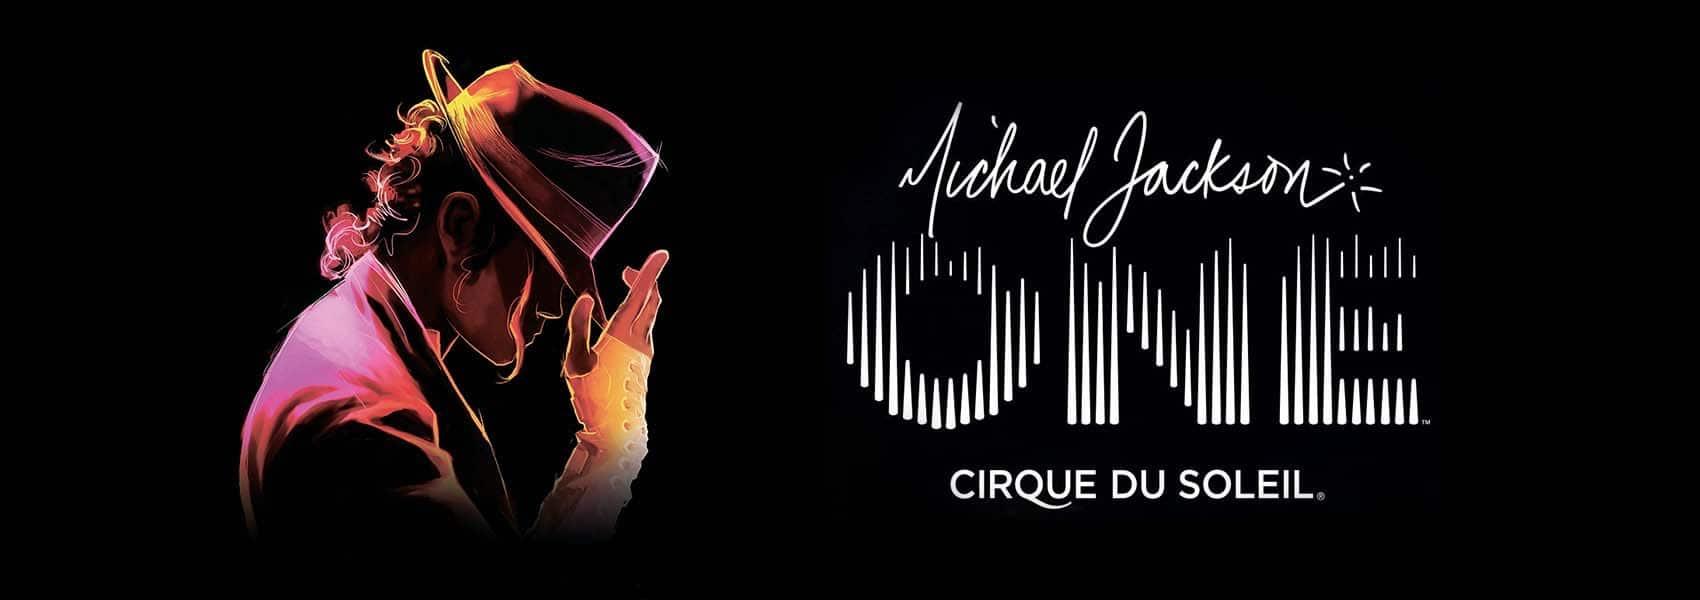 Michael-Cirque-Du-Soleil